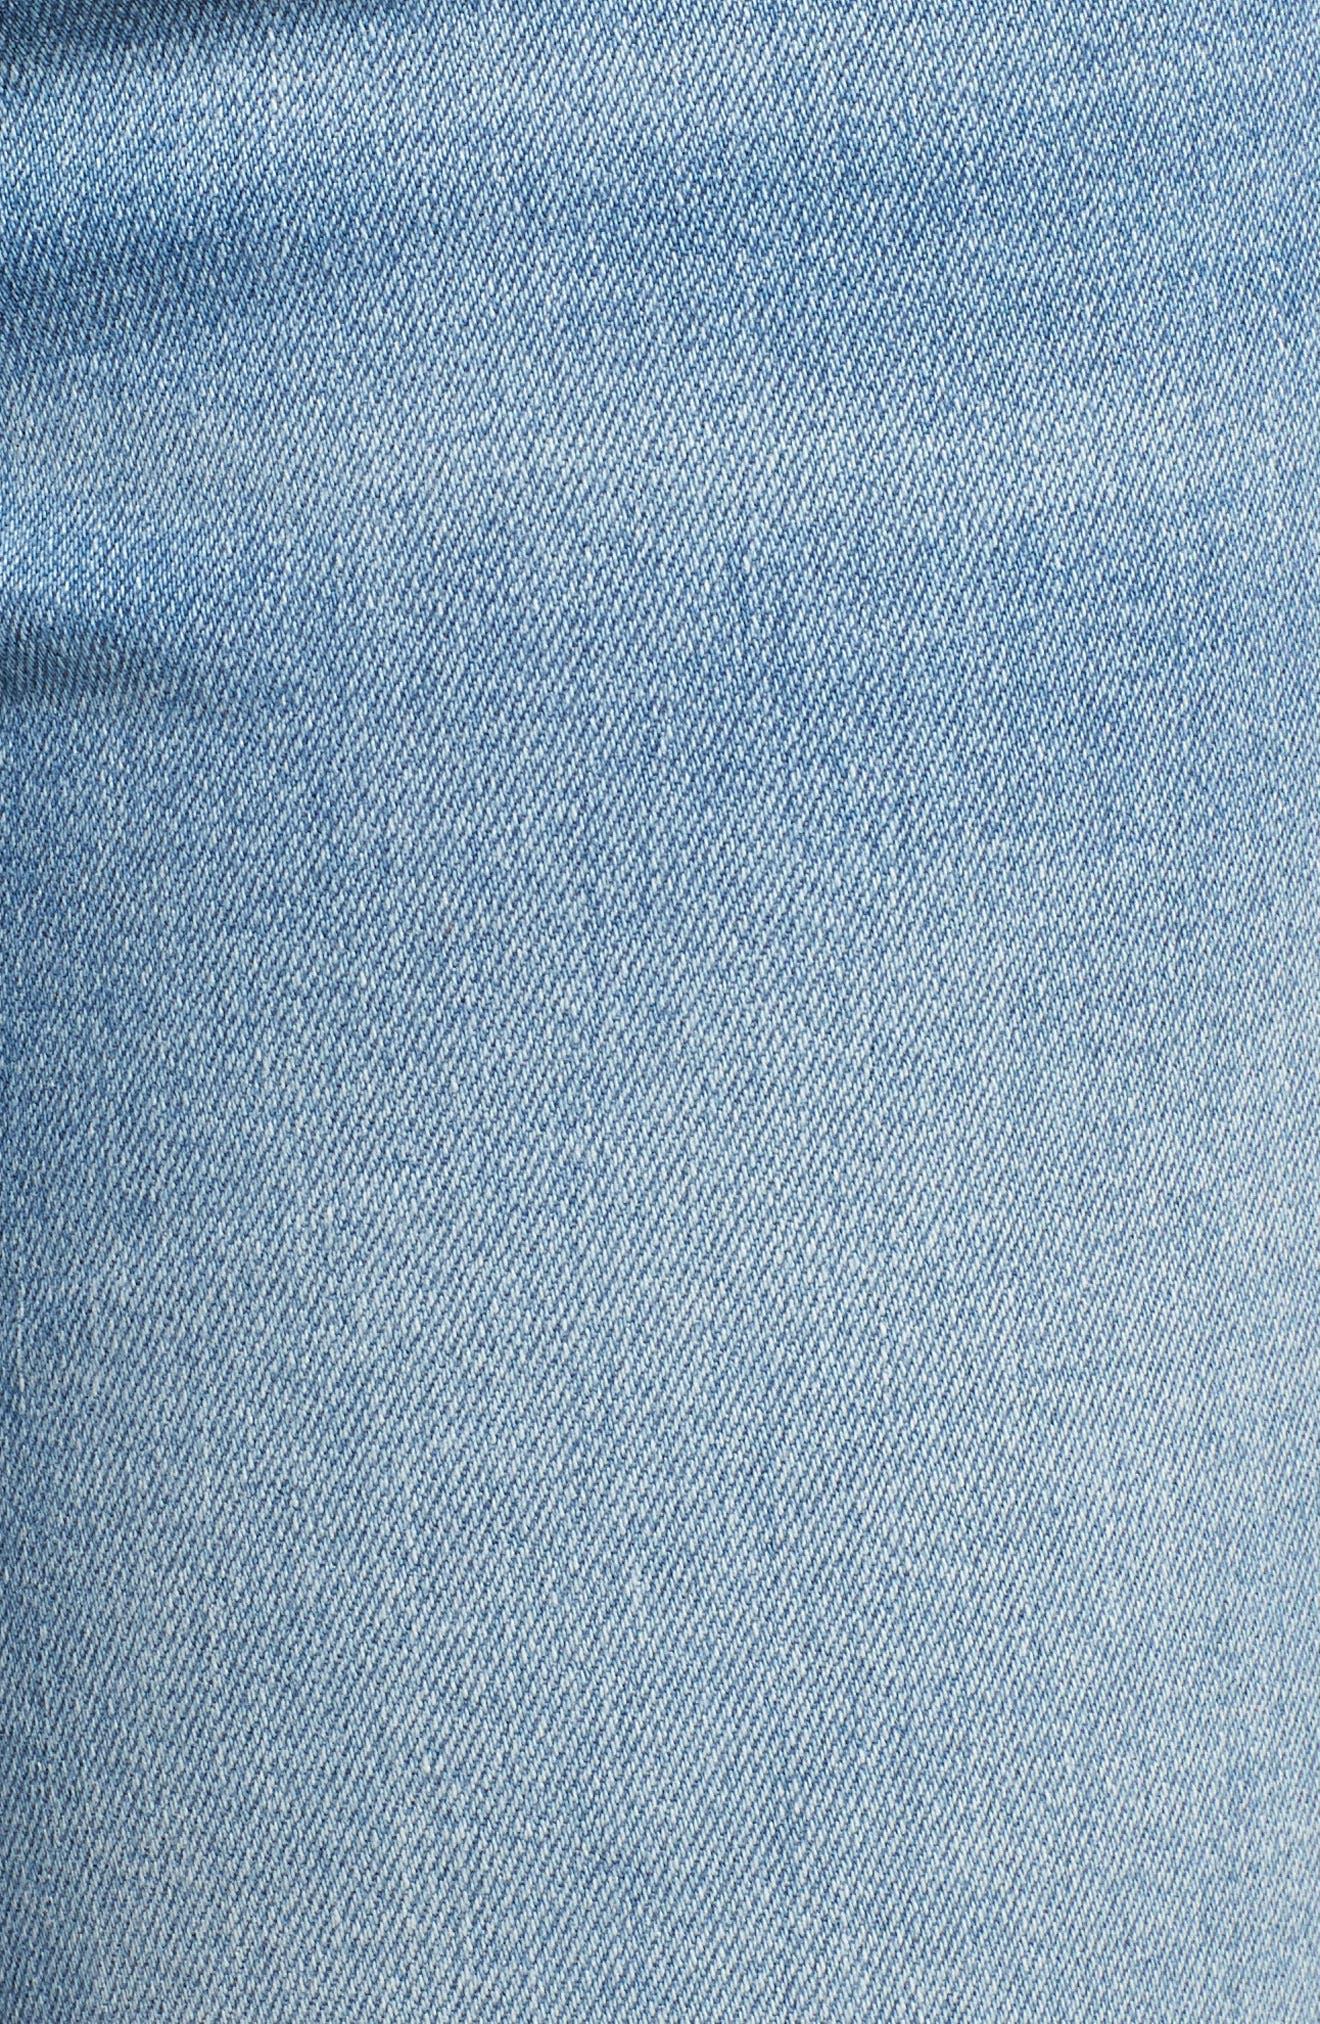 Adriana Ankle Zip Step Hem Jeans,                             Alternate thumbnail 6, color,                             Mid Fringe Nolita